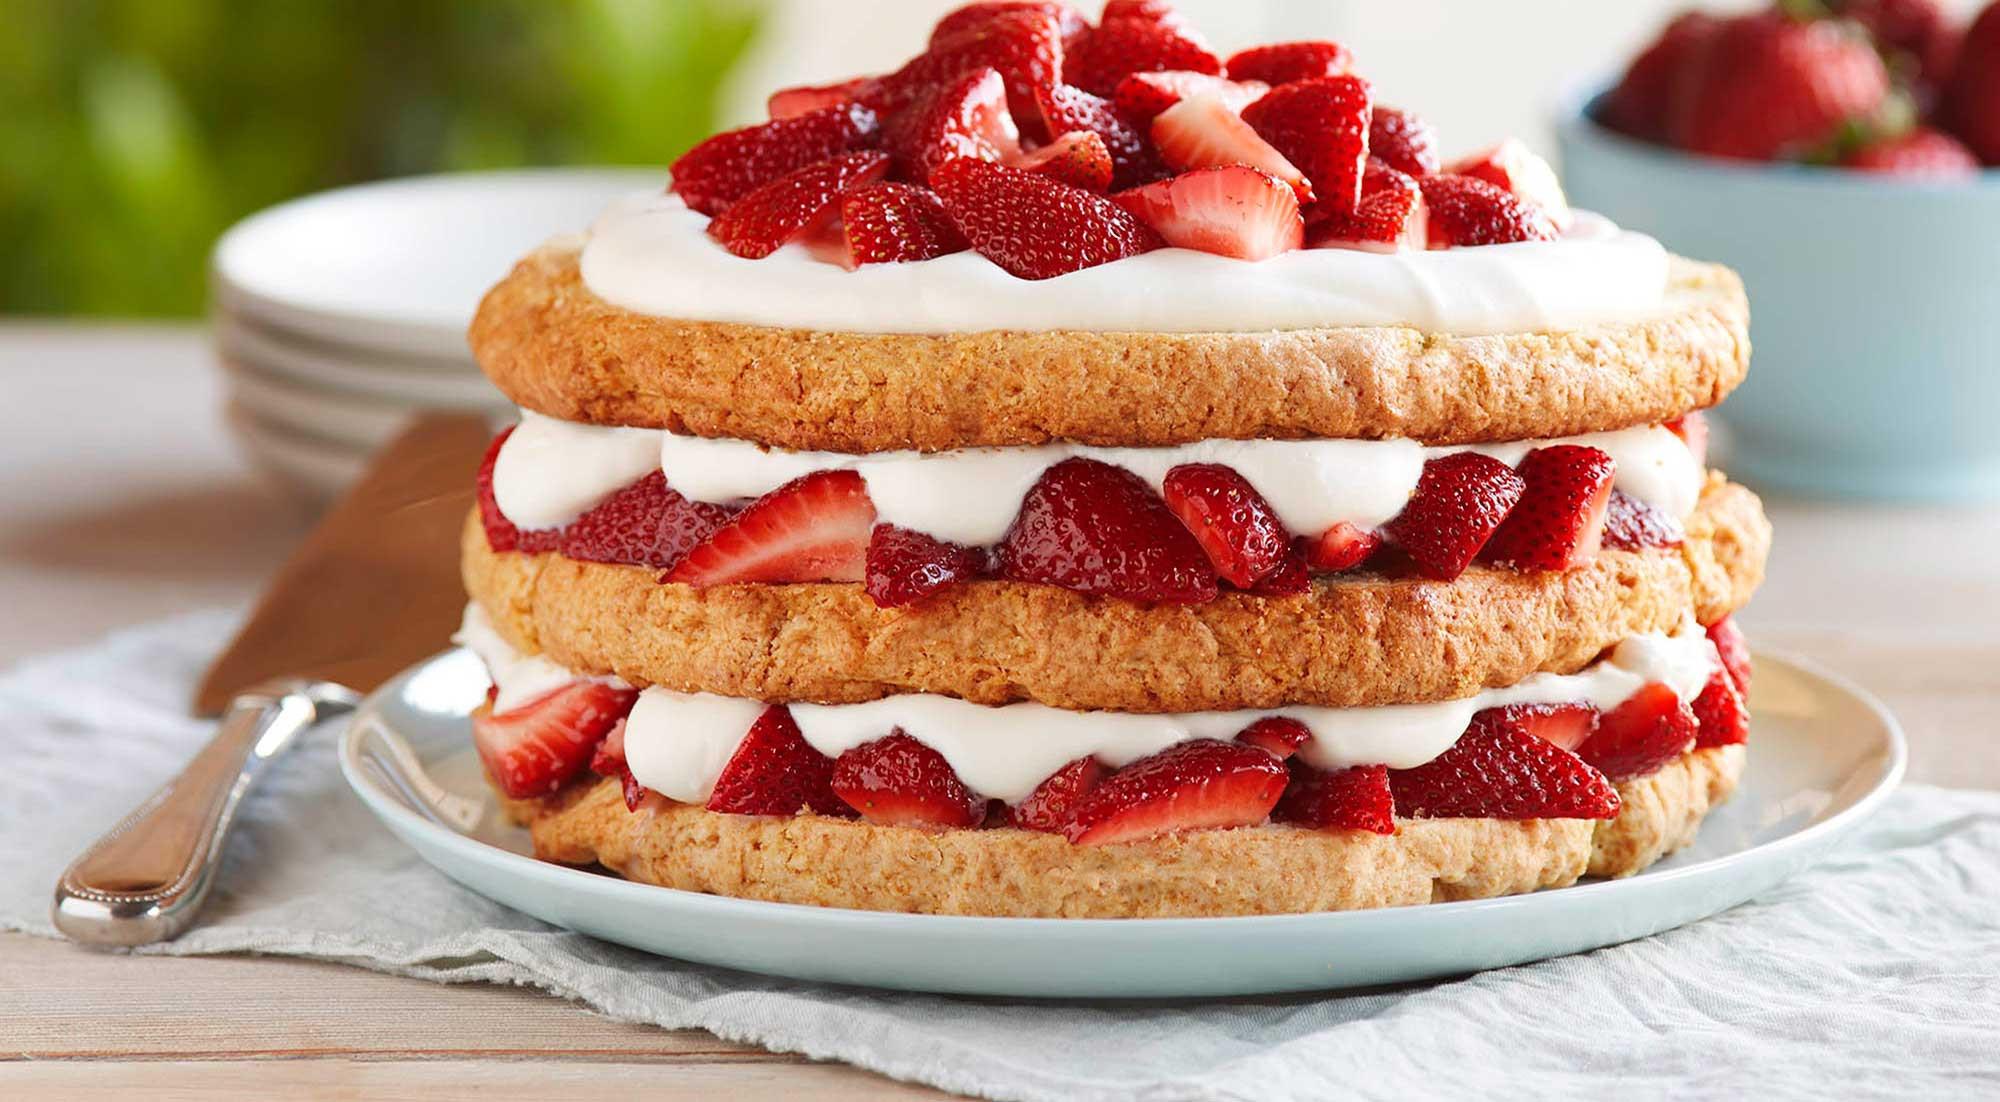 Strawberry Shortcake Biscuits Recipes  Classic Strawberry Shortcake Recipe